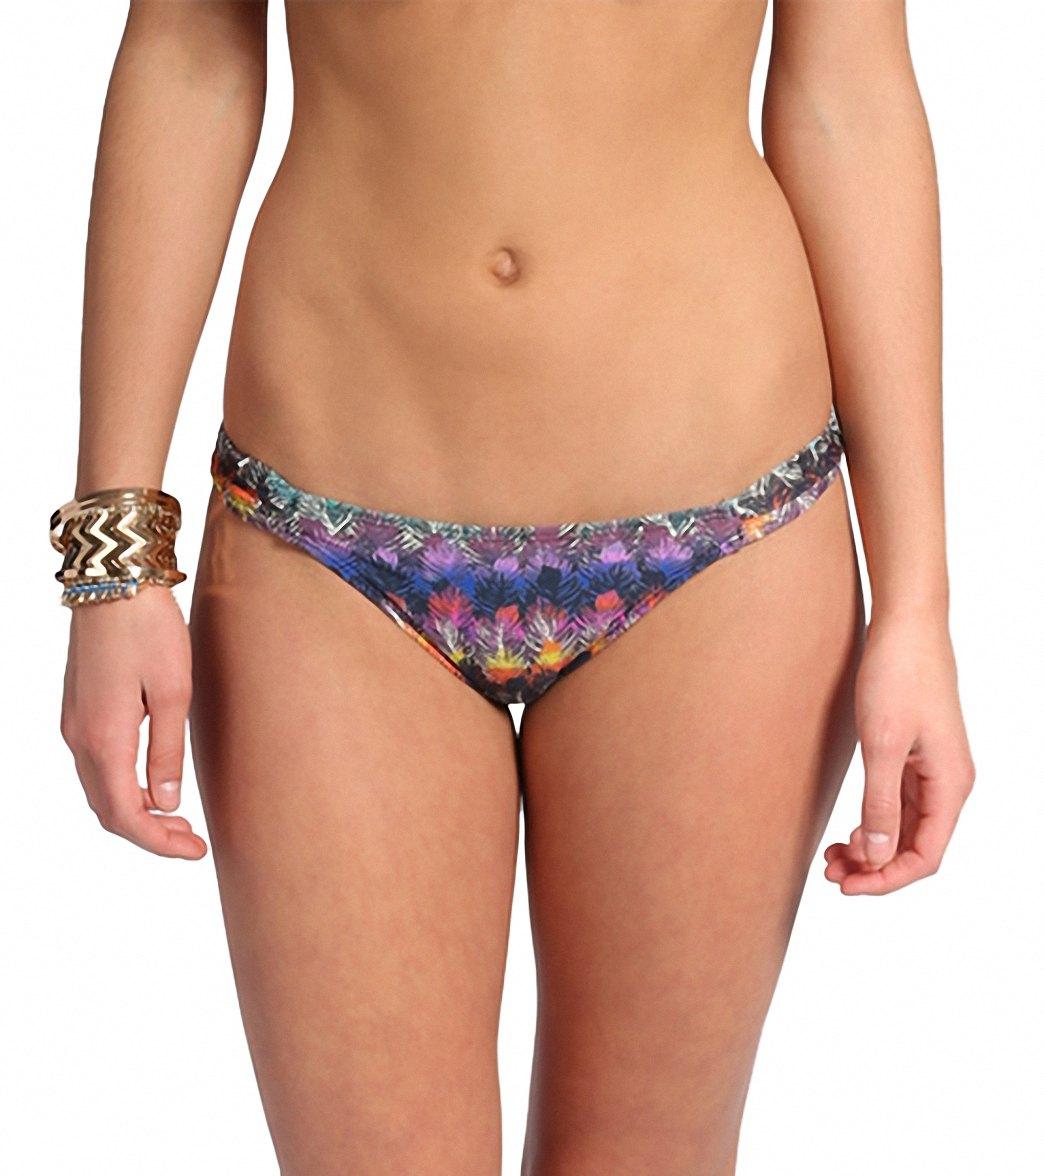 71ea98f203 Sofia Pisac Drape Bikini Bottom at SwimOutlet.com - Free Shipping